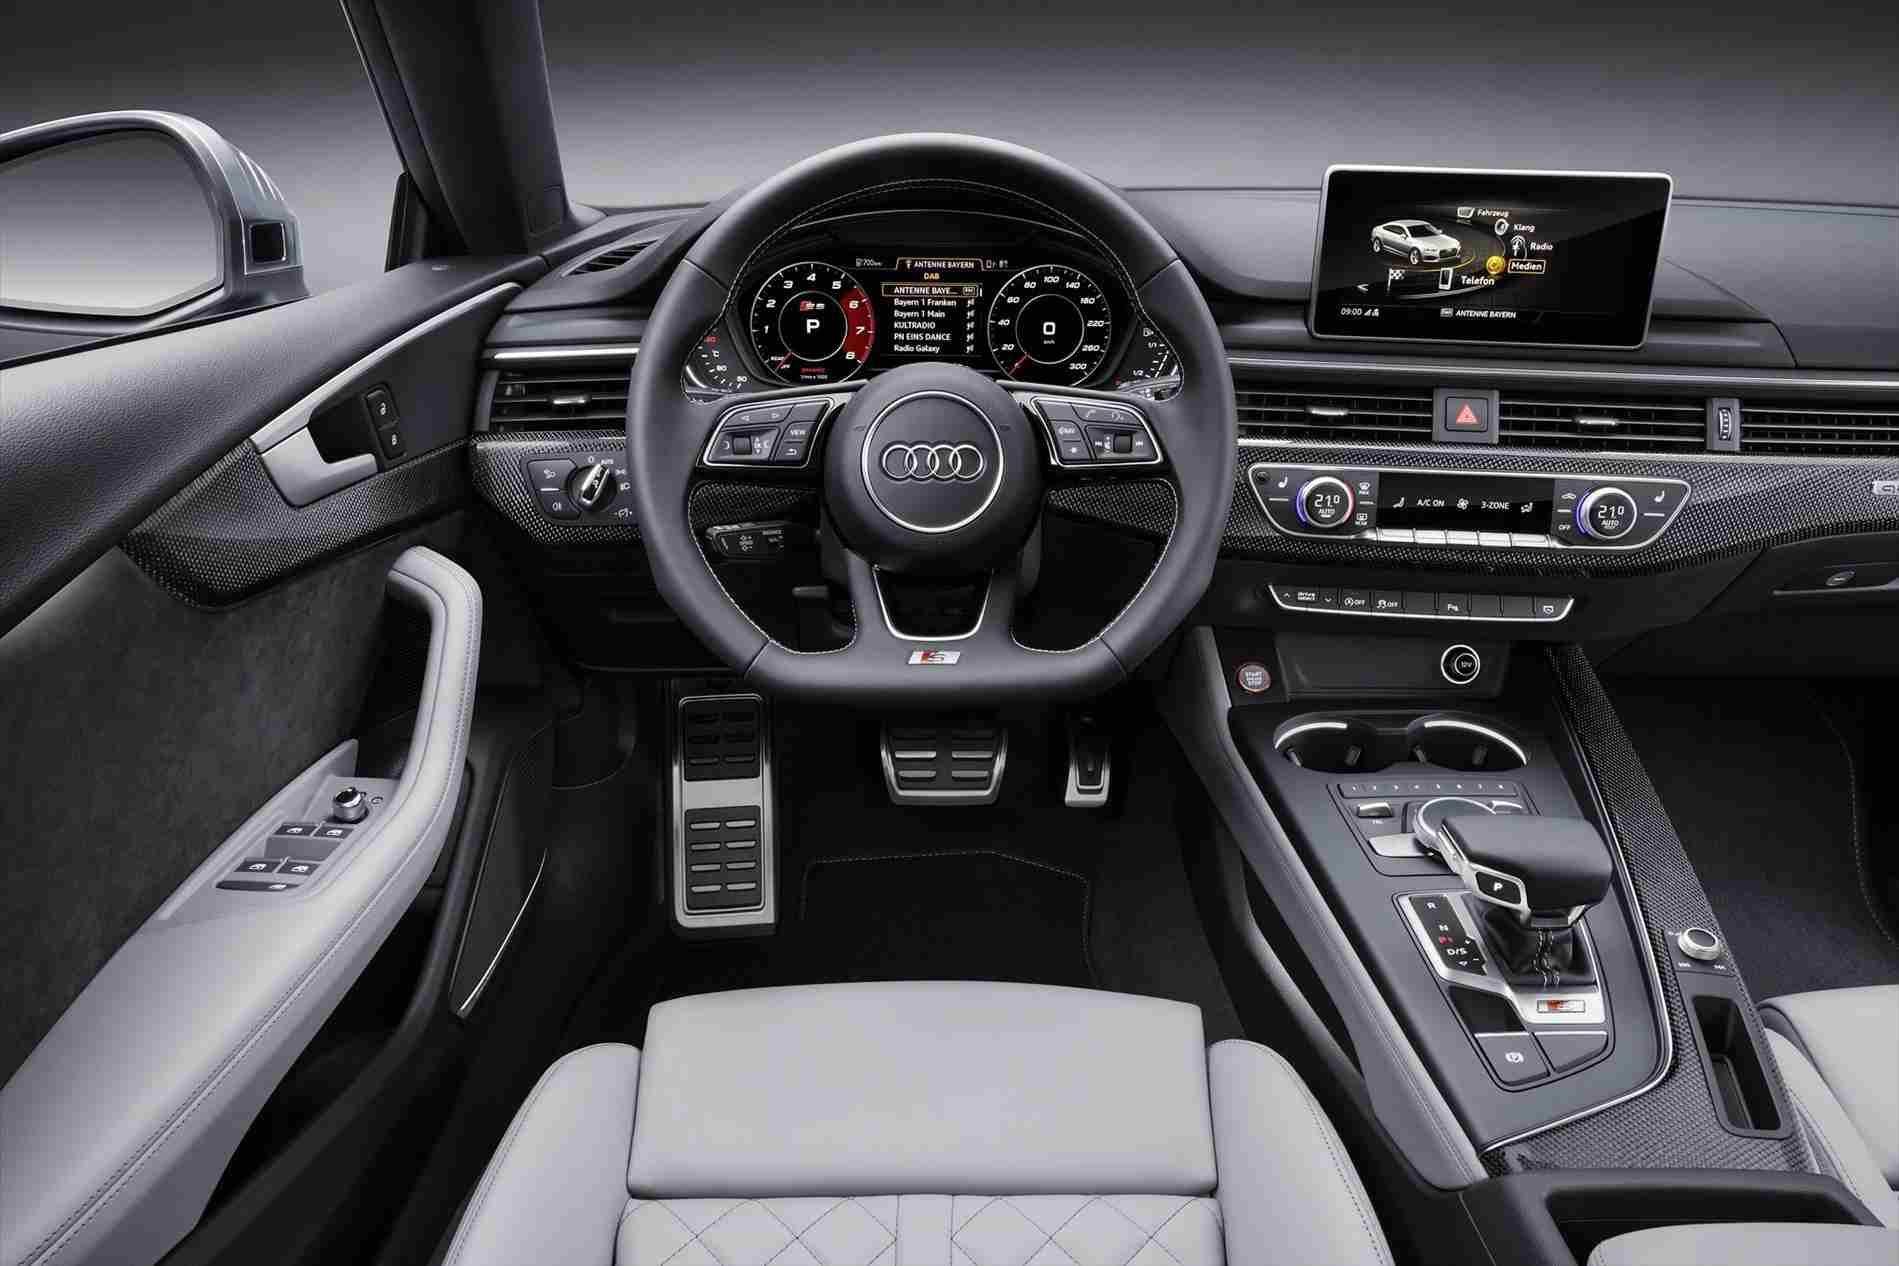 new audi a5 audi a6 audi 2017 a5 sportback volkswagen a5